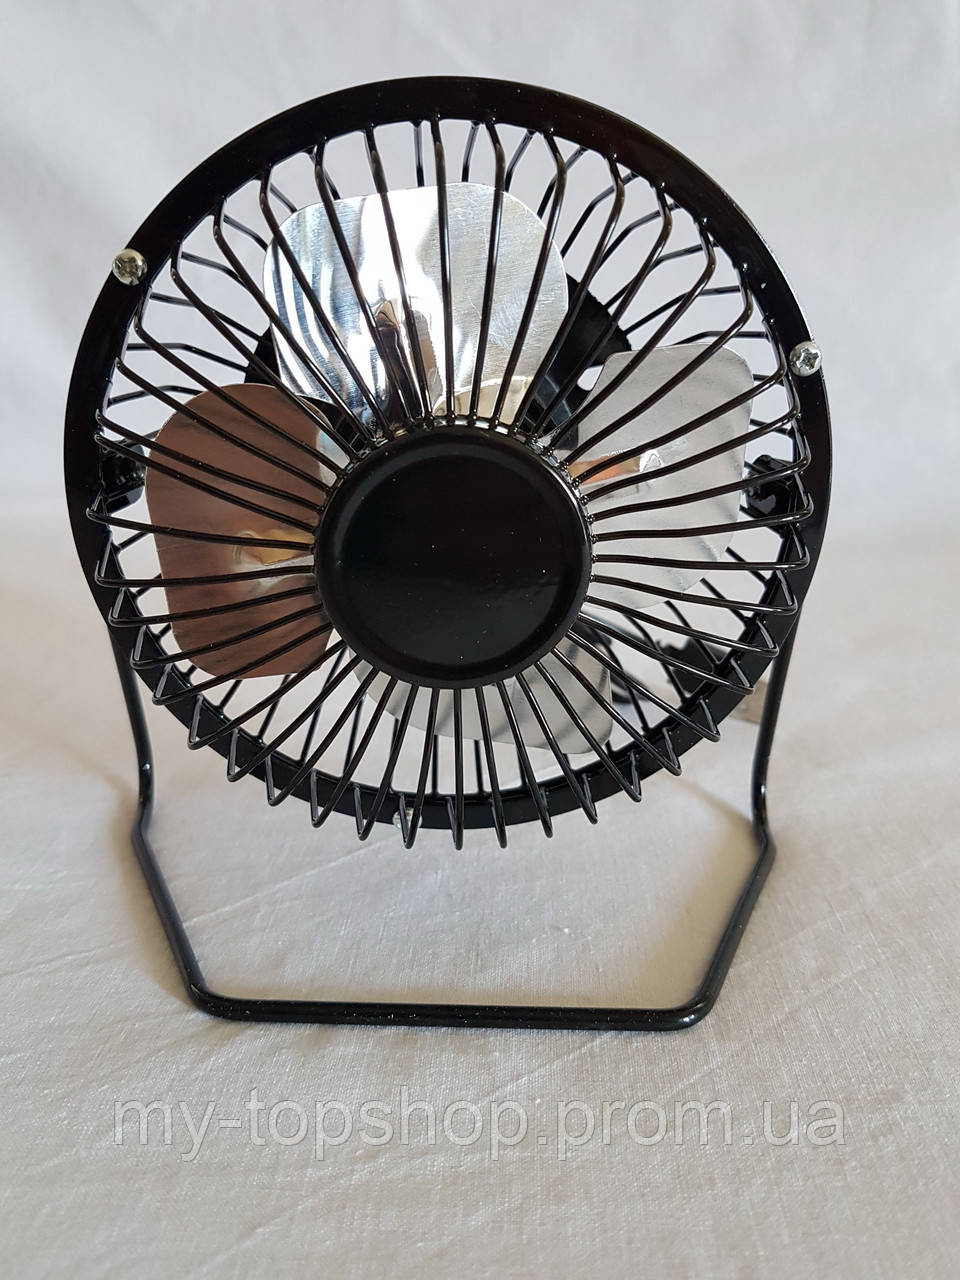 USB мини-вентилятор usb mini fans FX